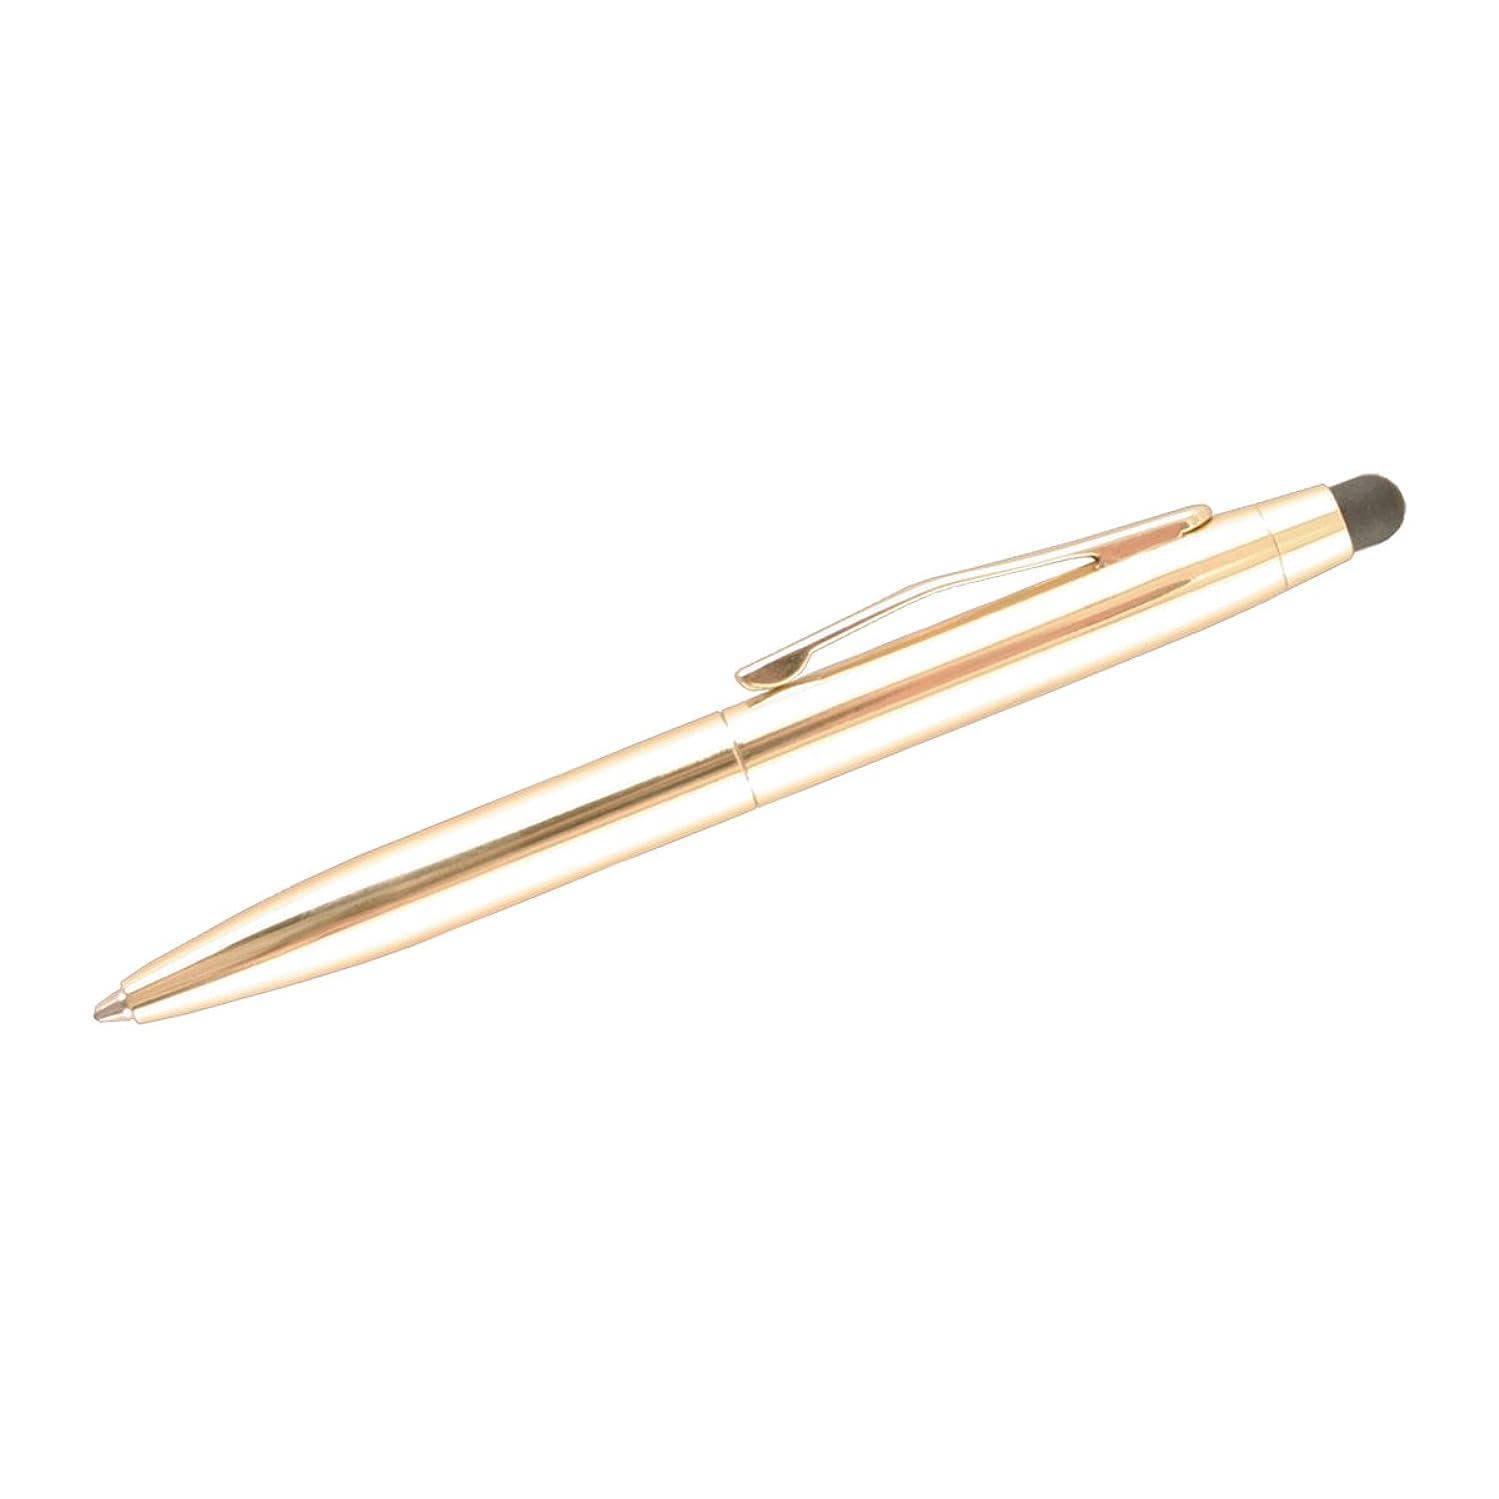 Uchida Of America 007I-C-GLD St. Tropez 2 in 1 Stylus and Pen, Gold